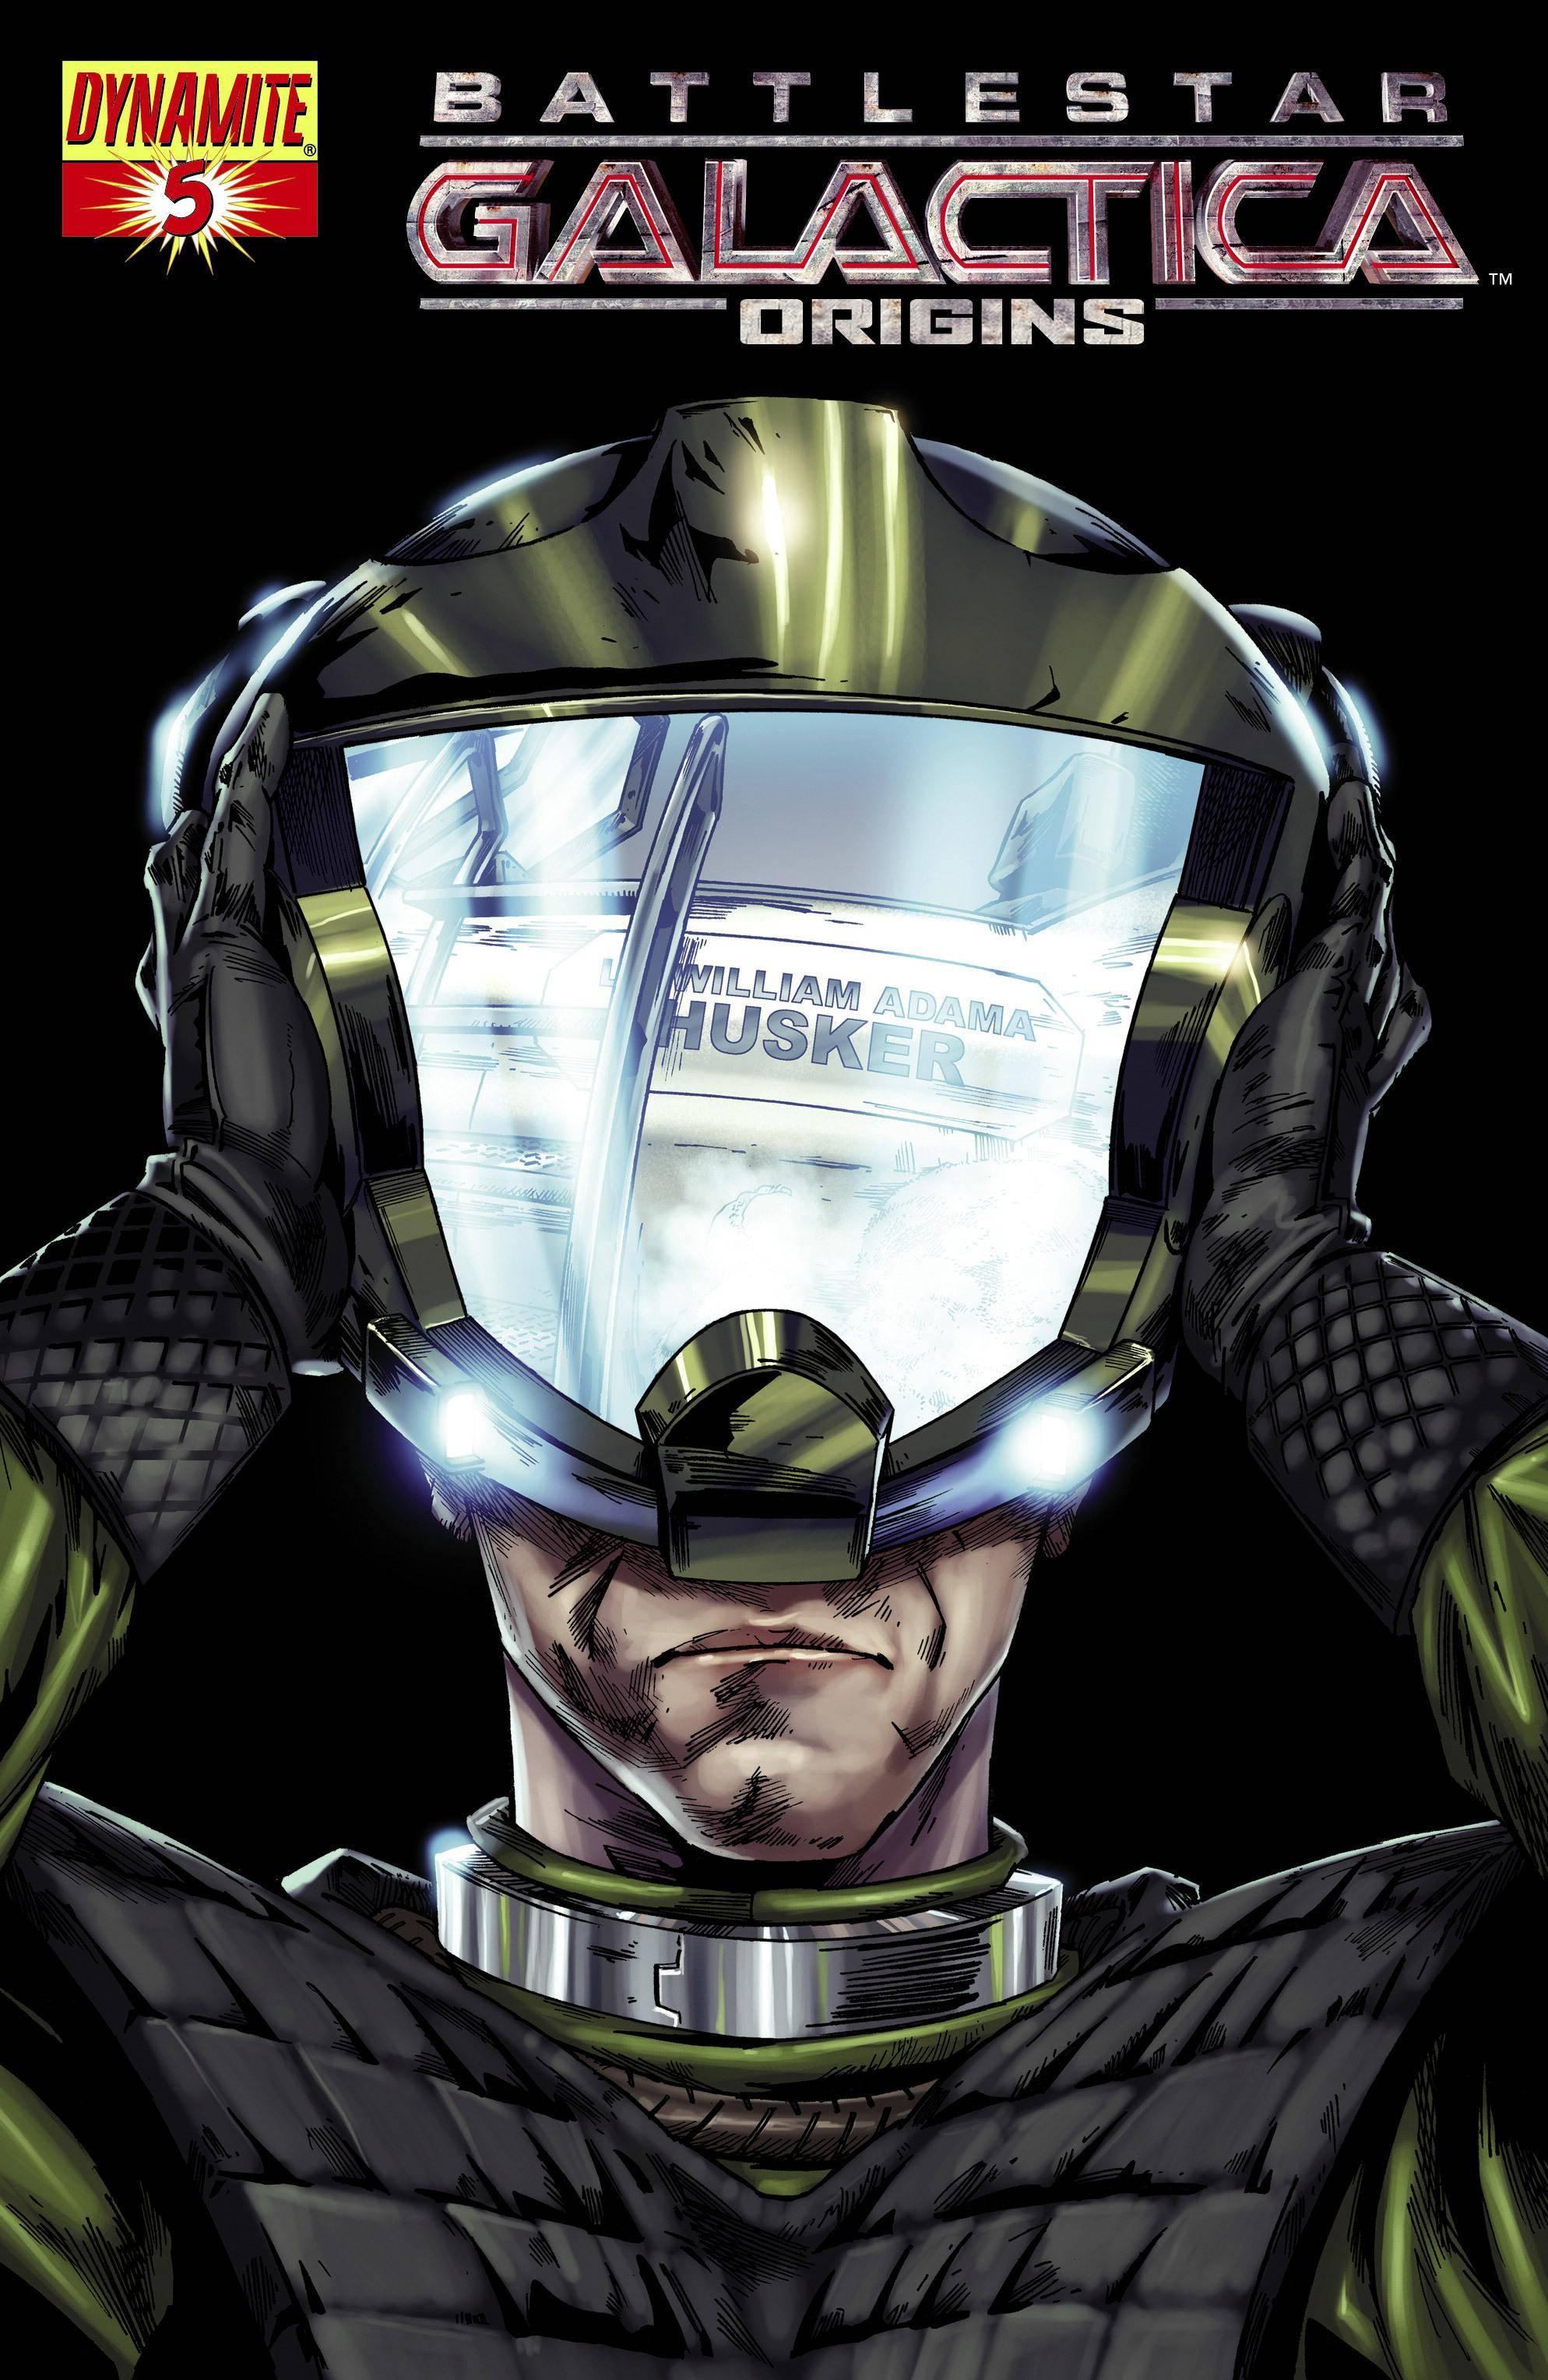 Battlestar Galactica - Origins 005 - Adama 01 of 04 2008 2 covers digital